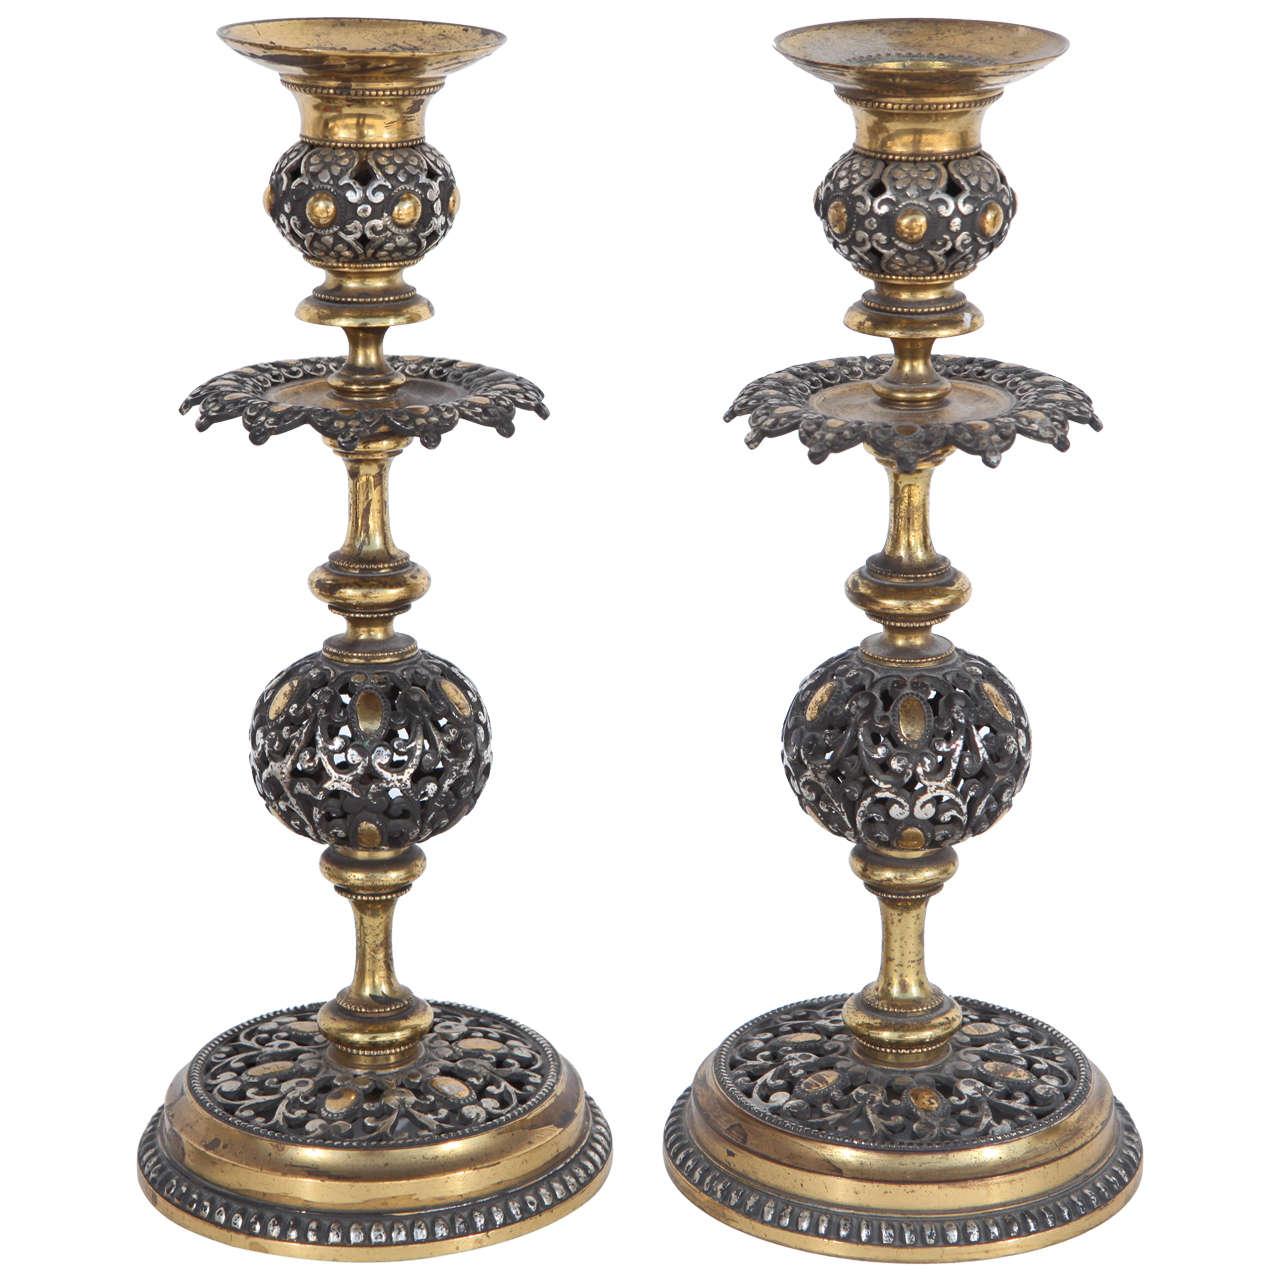 Pair Of 19th Century Italian Pierced Bronze Candlesticks